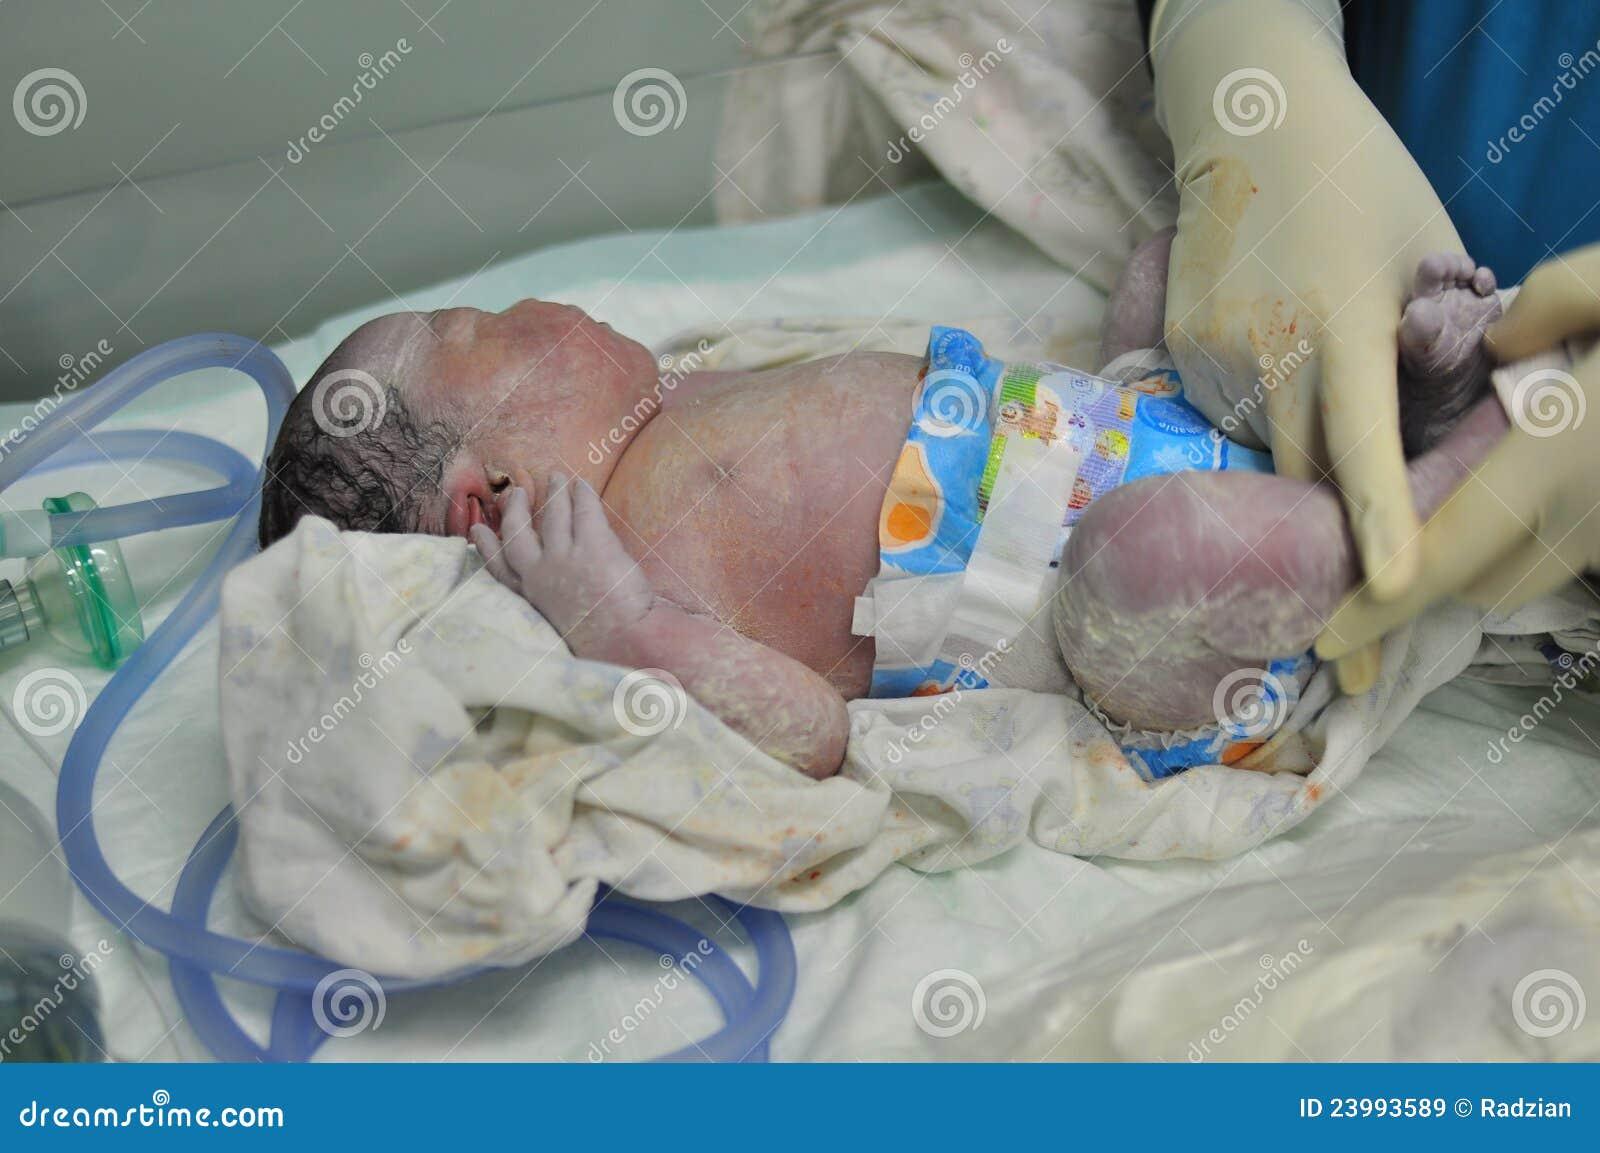 Just born baby